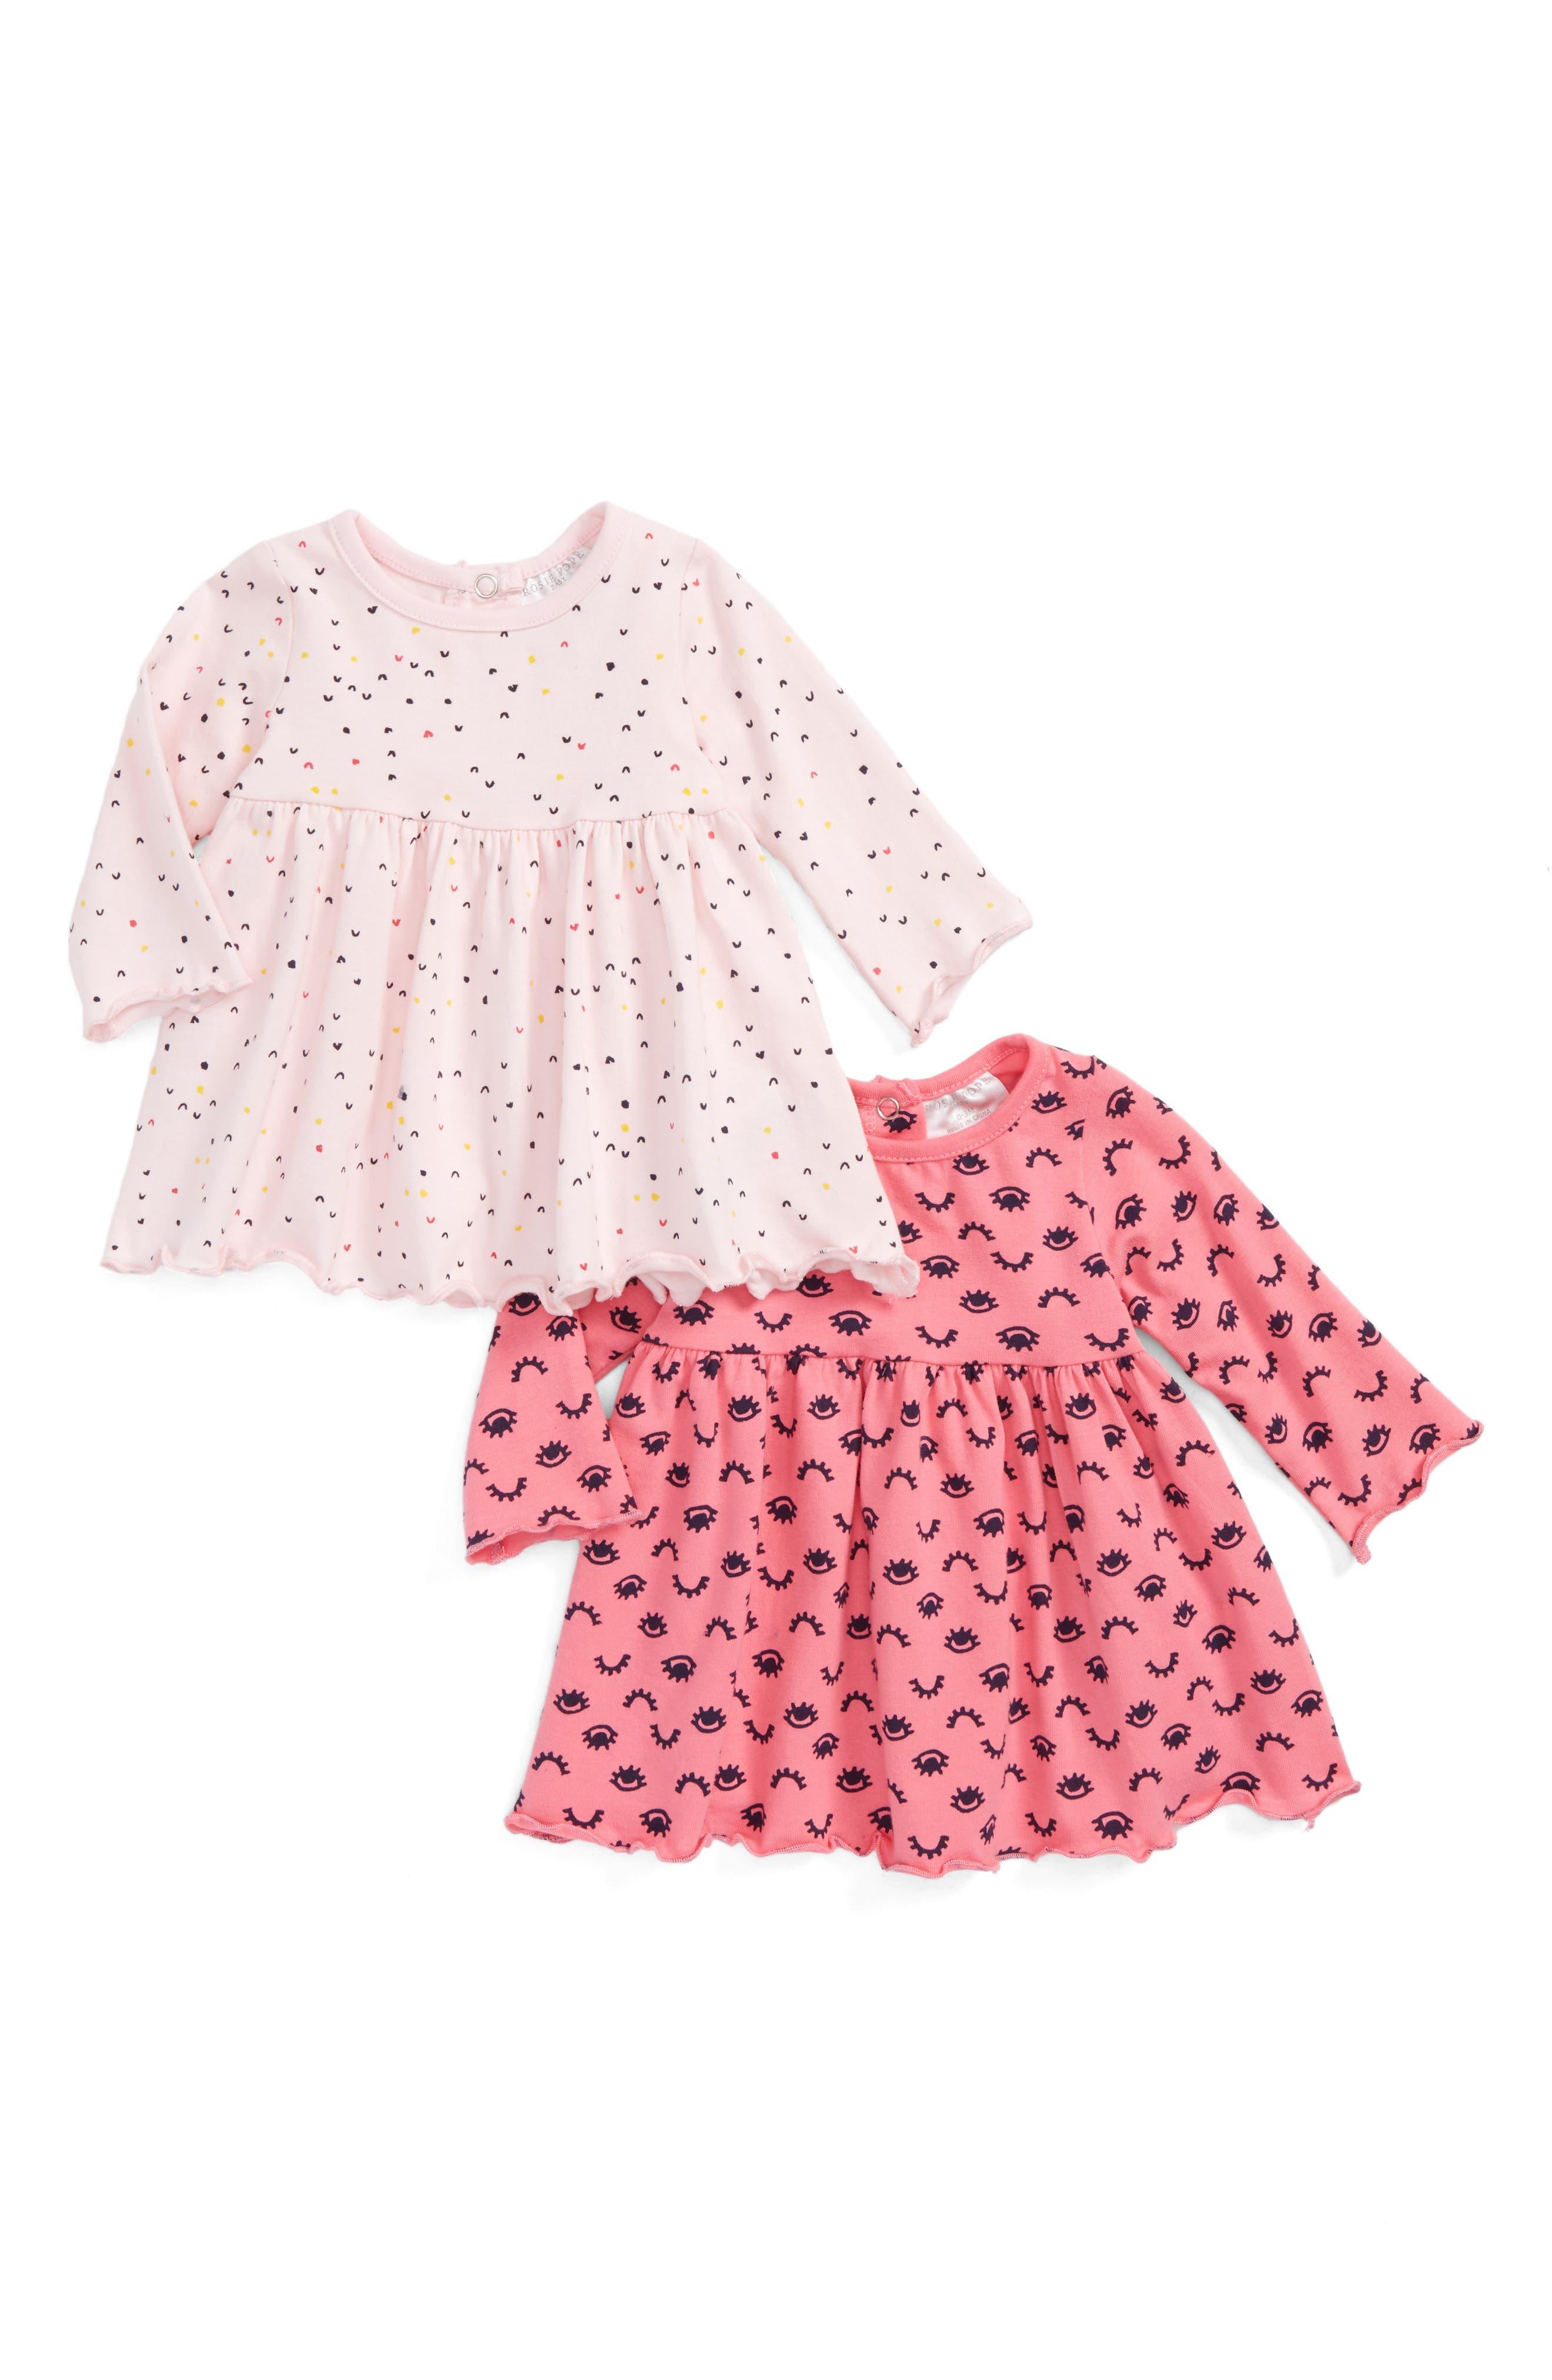 Alternate Image 1 Selected - Rosie Pope 2-Pack Print Dresses (Baby Girls)